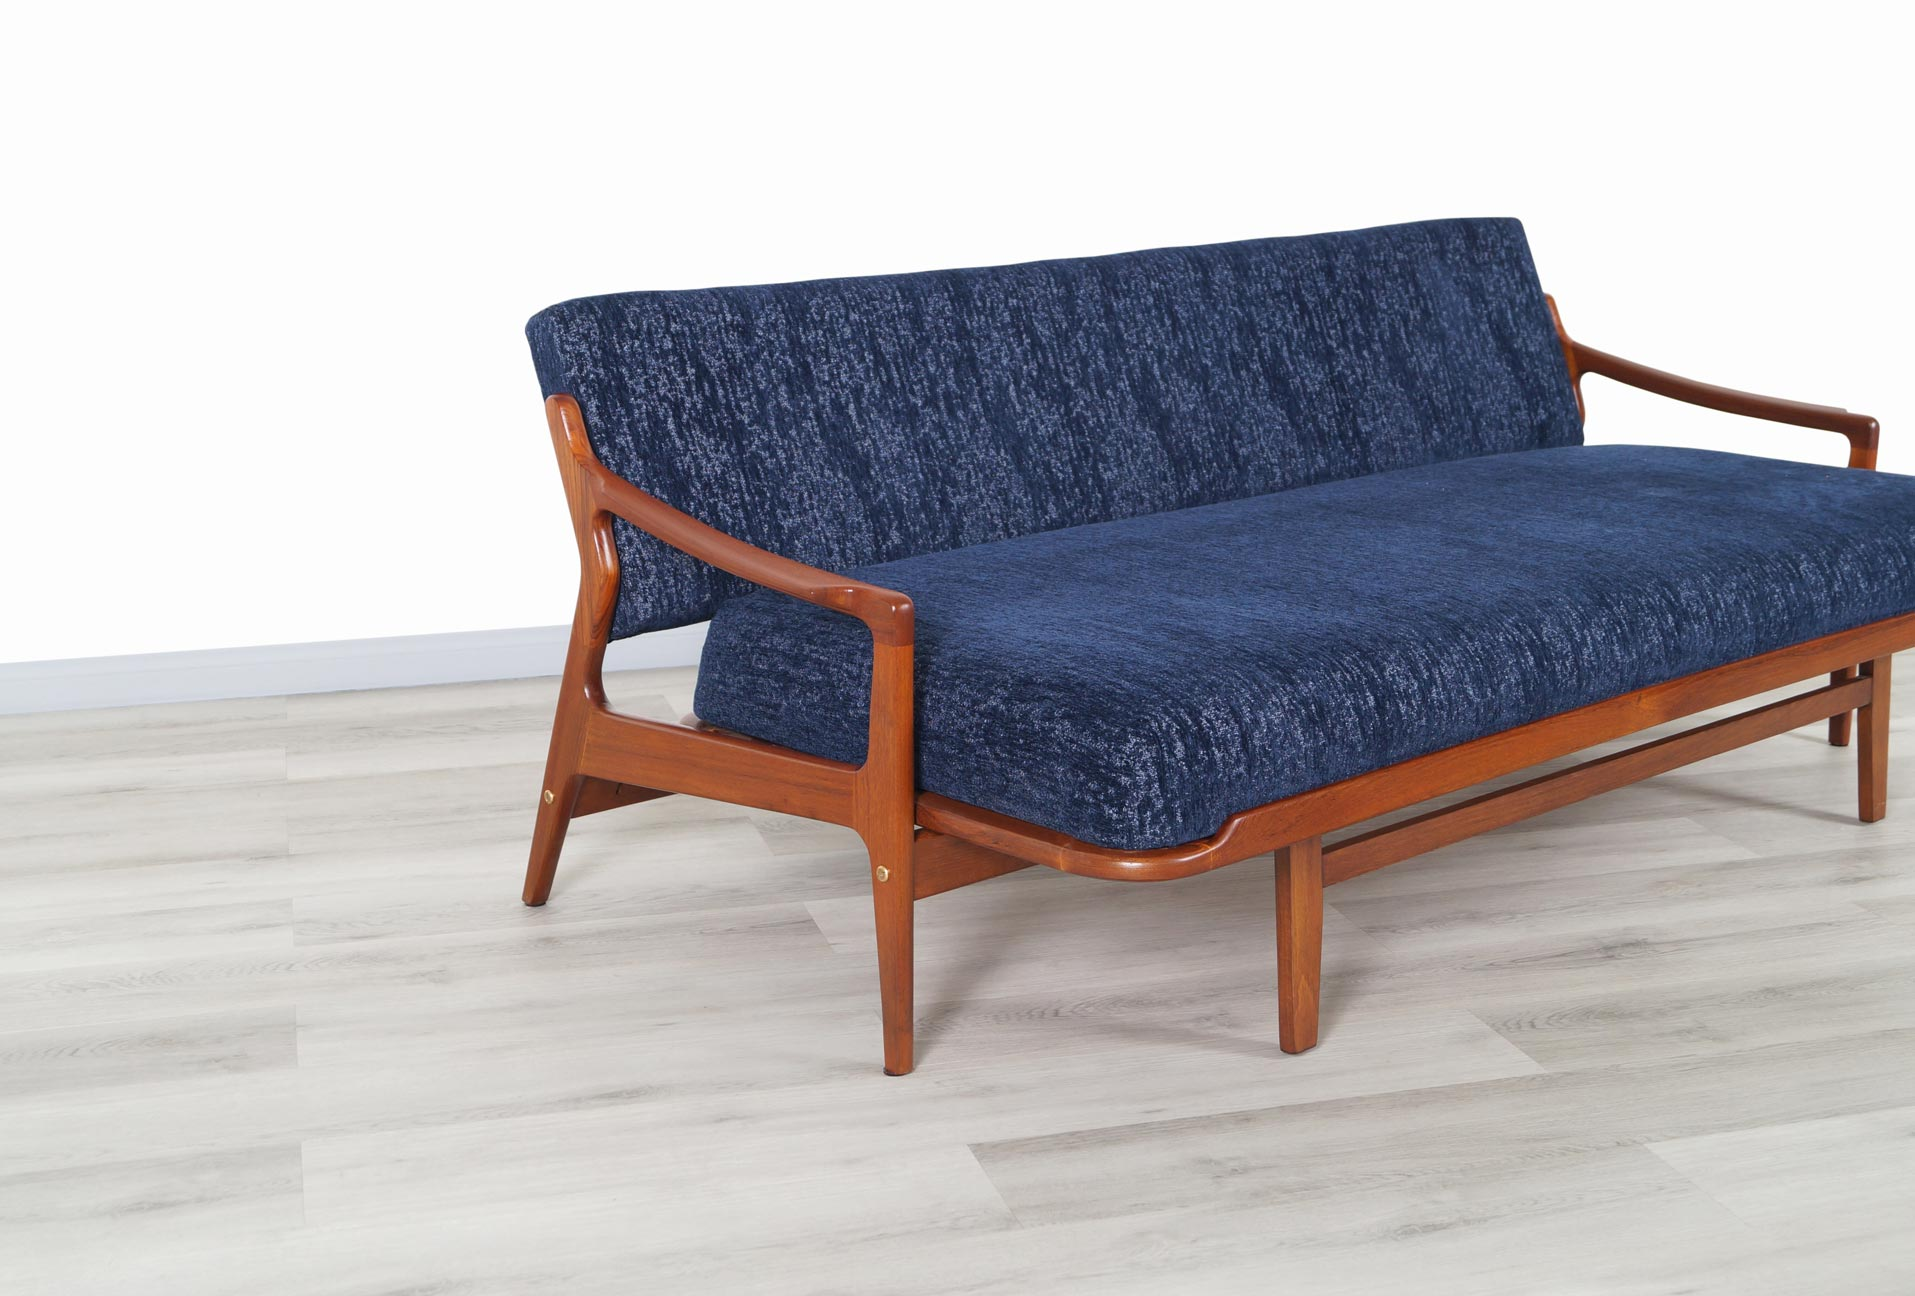 Danish Modern Teak Daybed Sofa by Arne Wahl Iversen